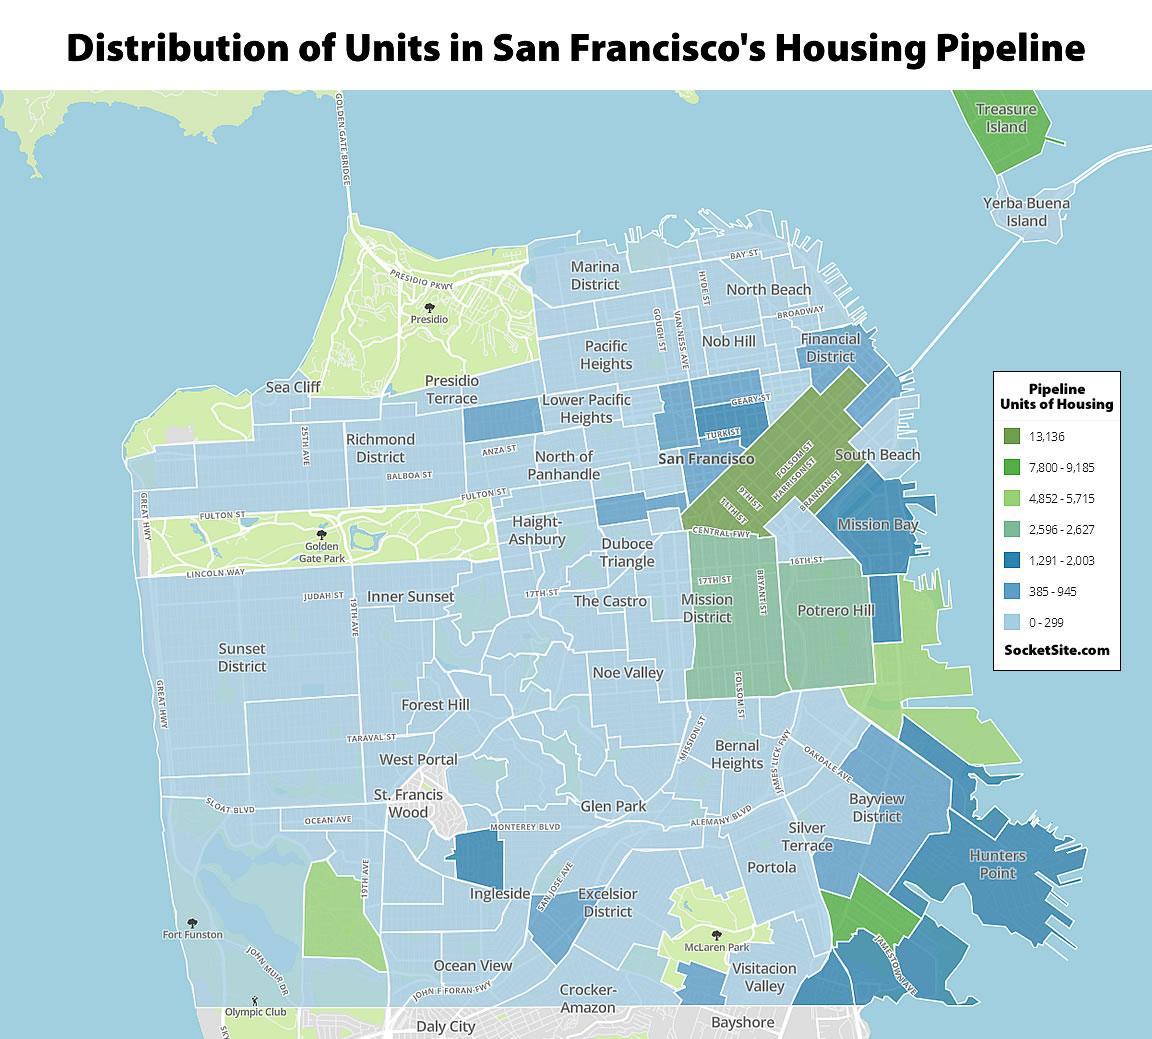 Pipeline of Development in San Francisco Ticks Up, Construction Too